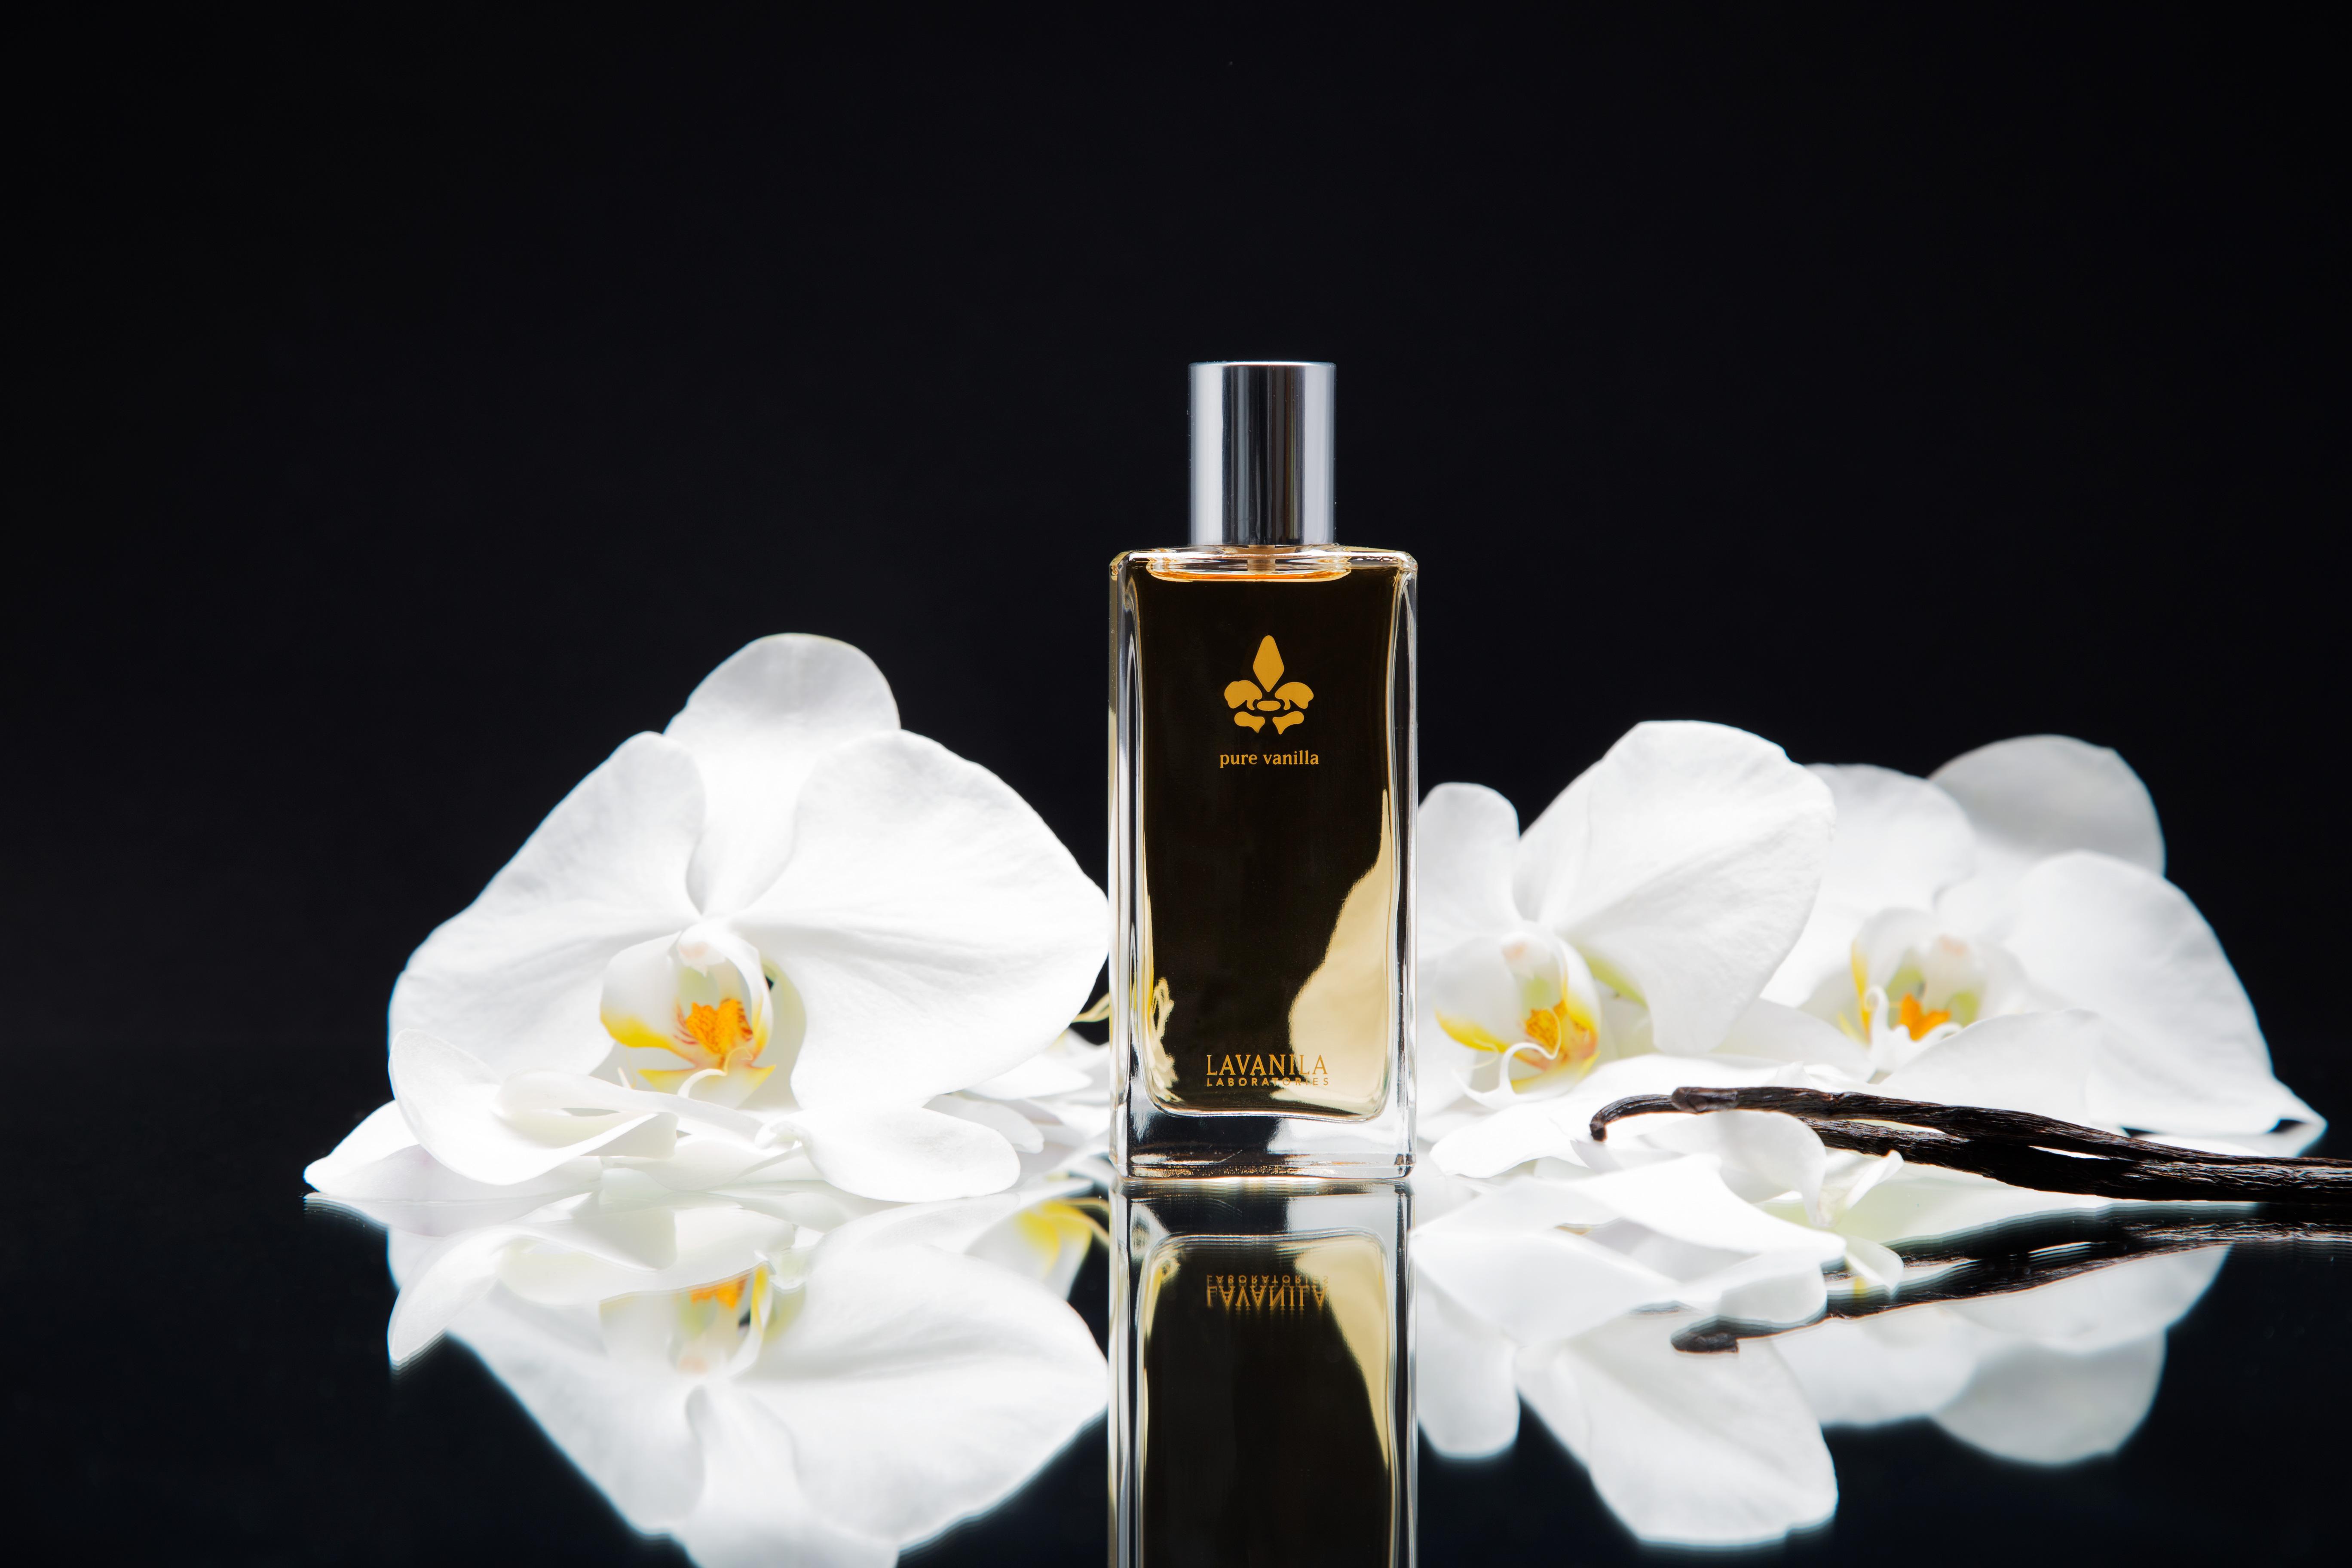 LAVANILA Pure Vanilla Perfume